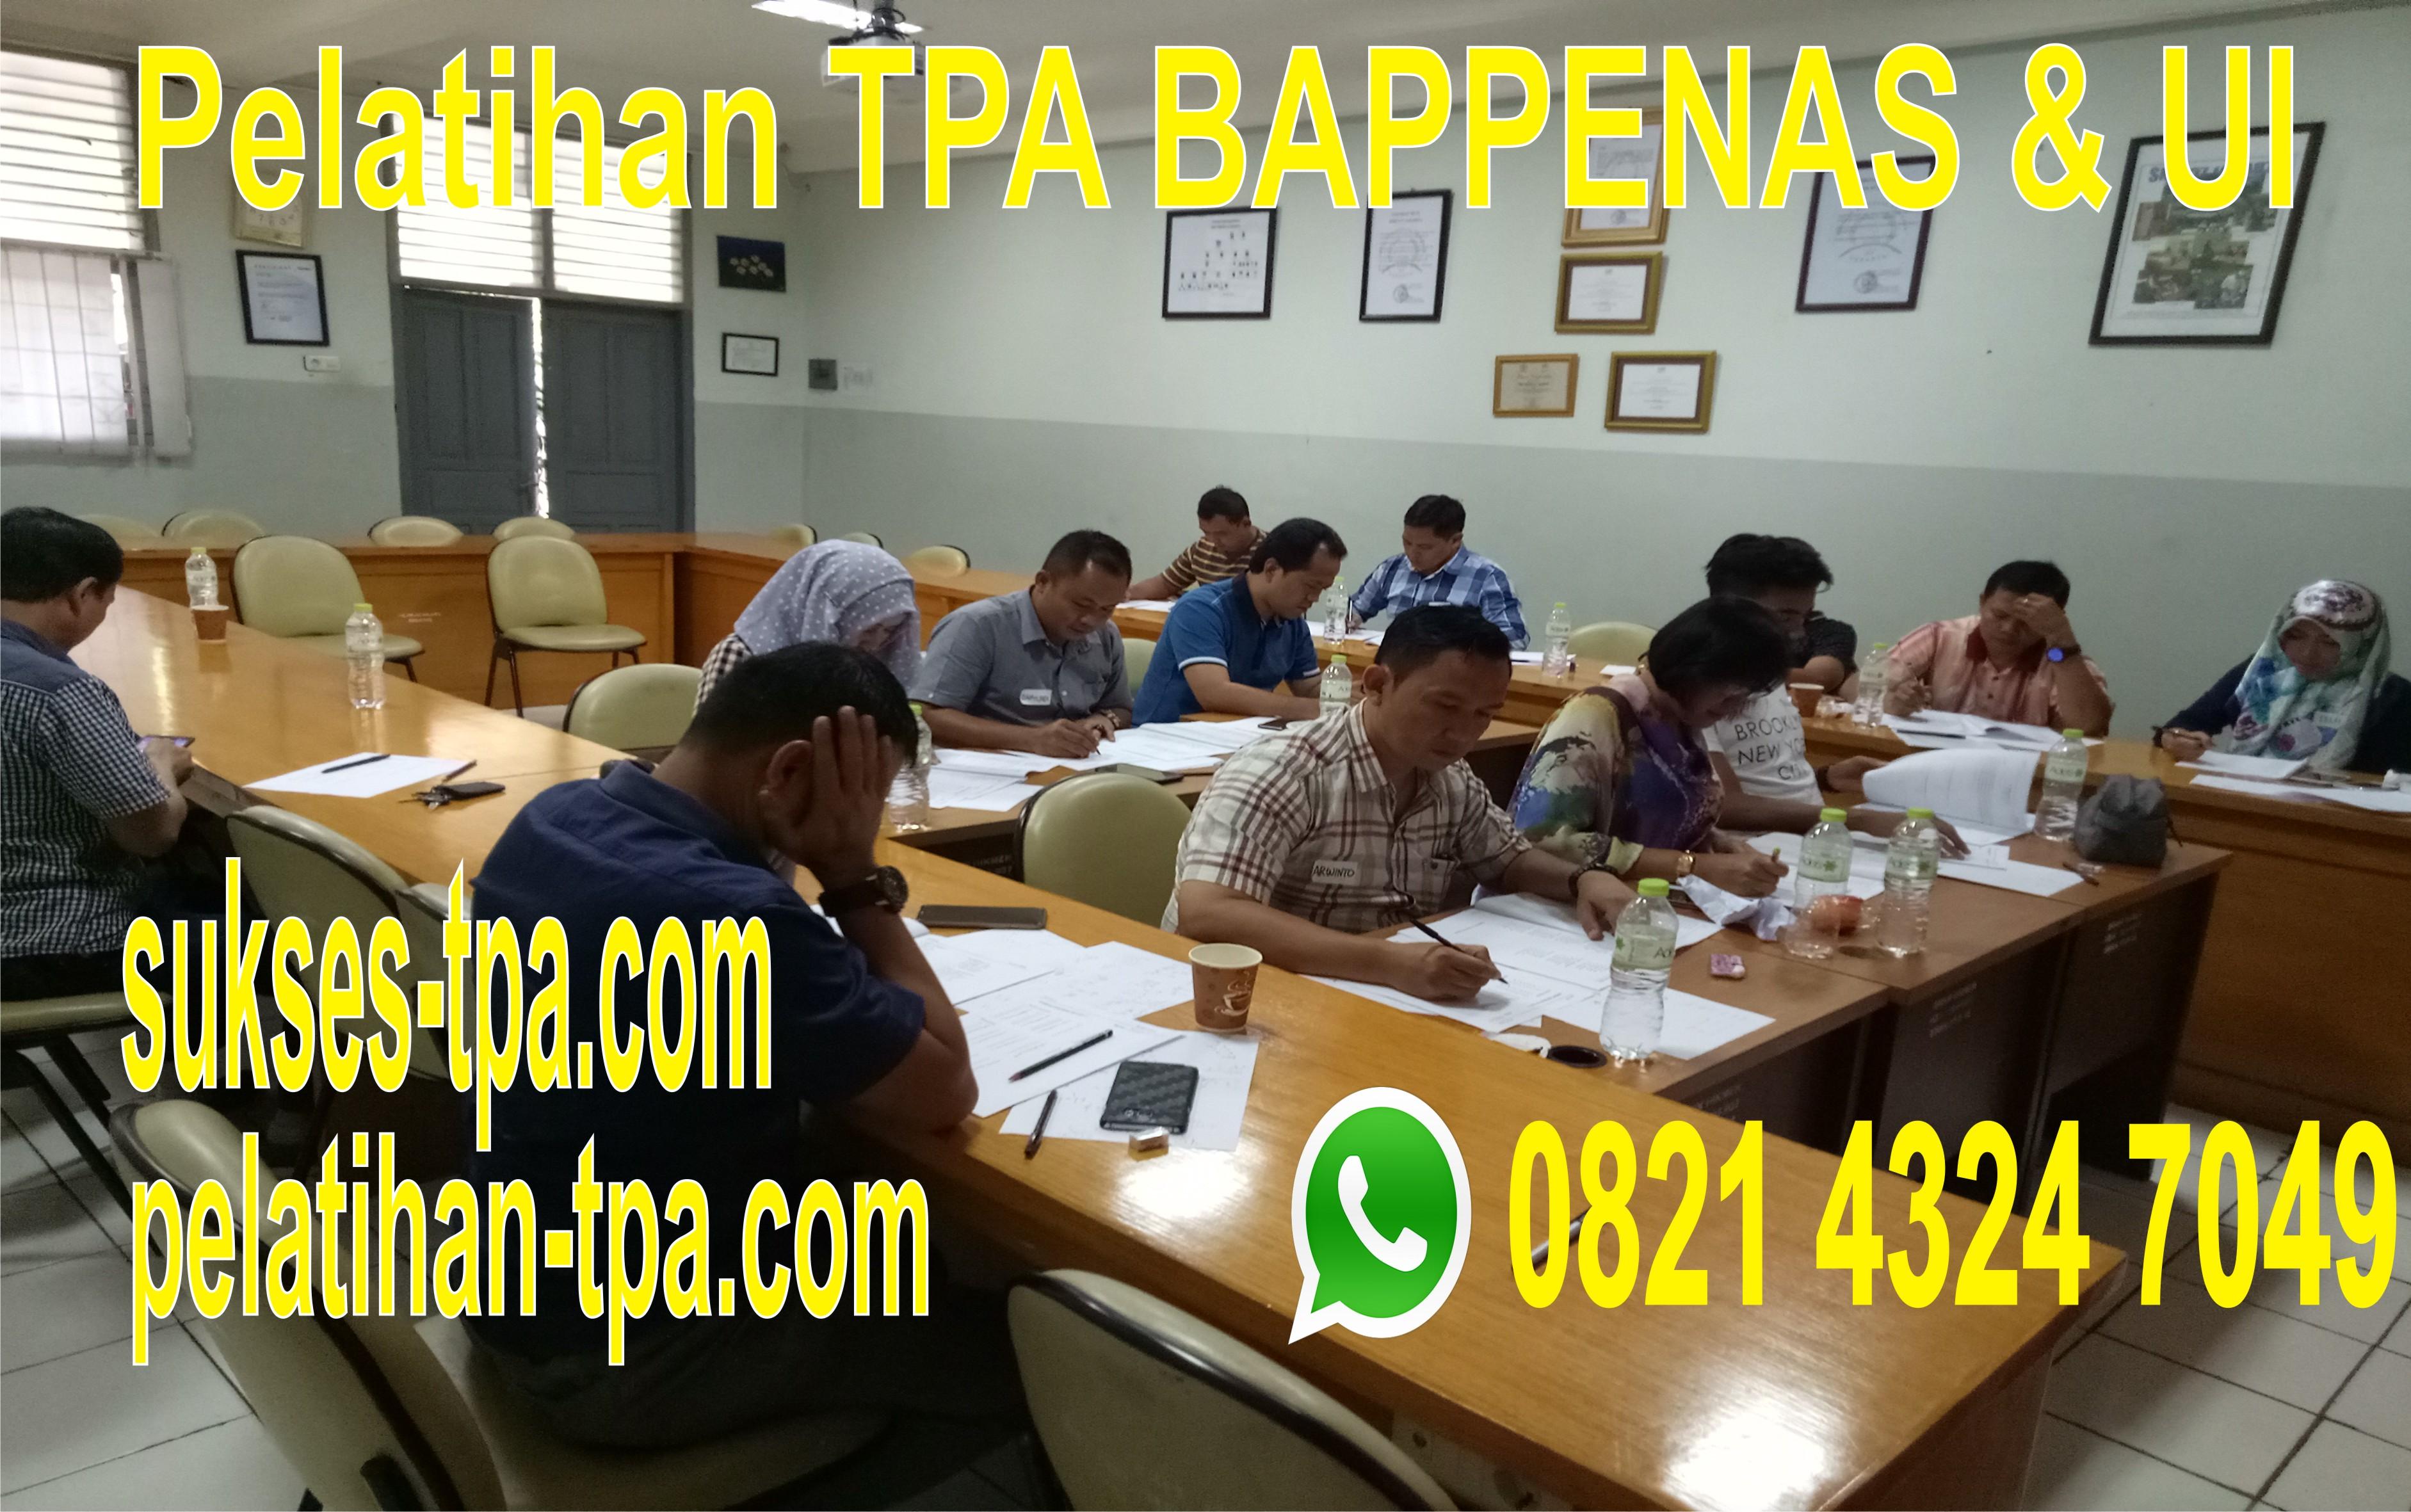 Pelatihan TPA Di Jakarta